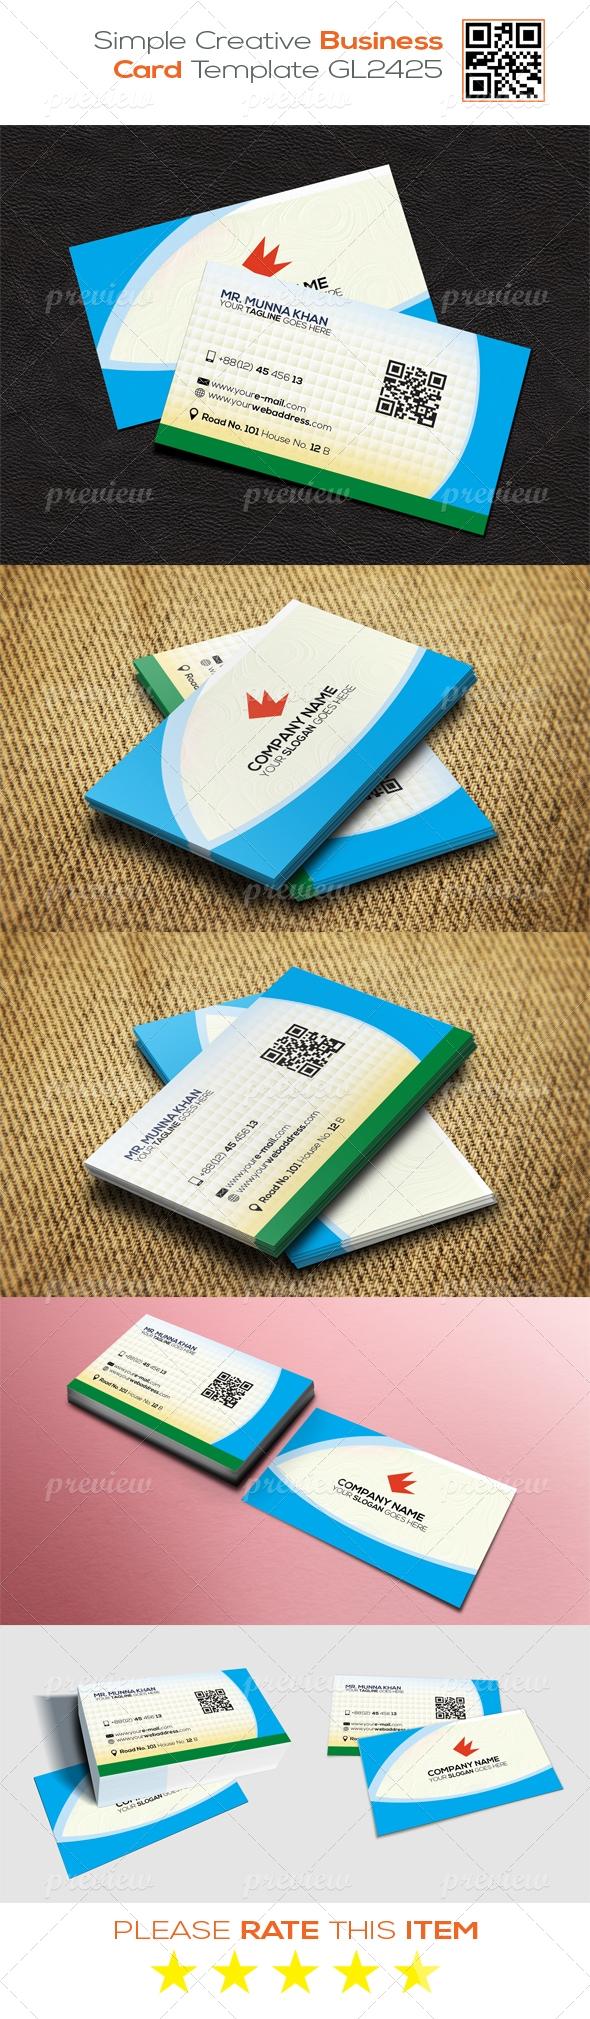 Simple Creative Business Card Template GL2426